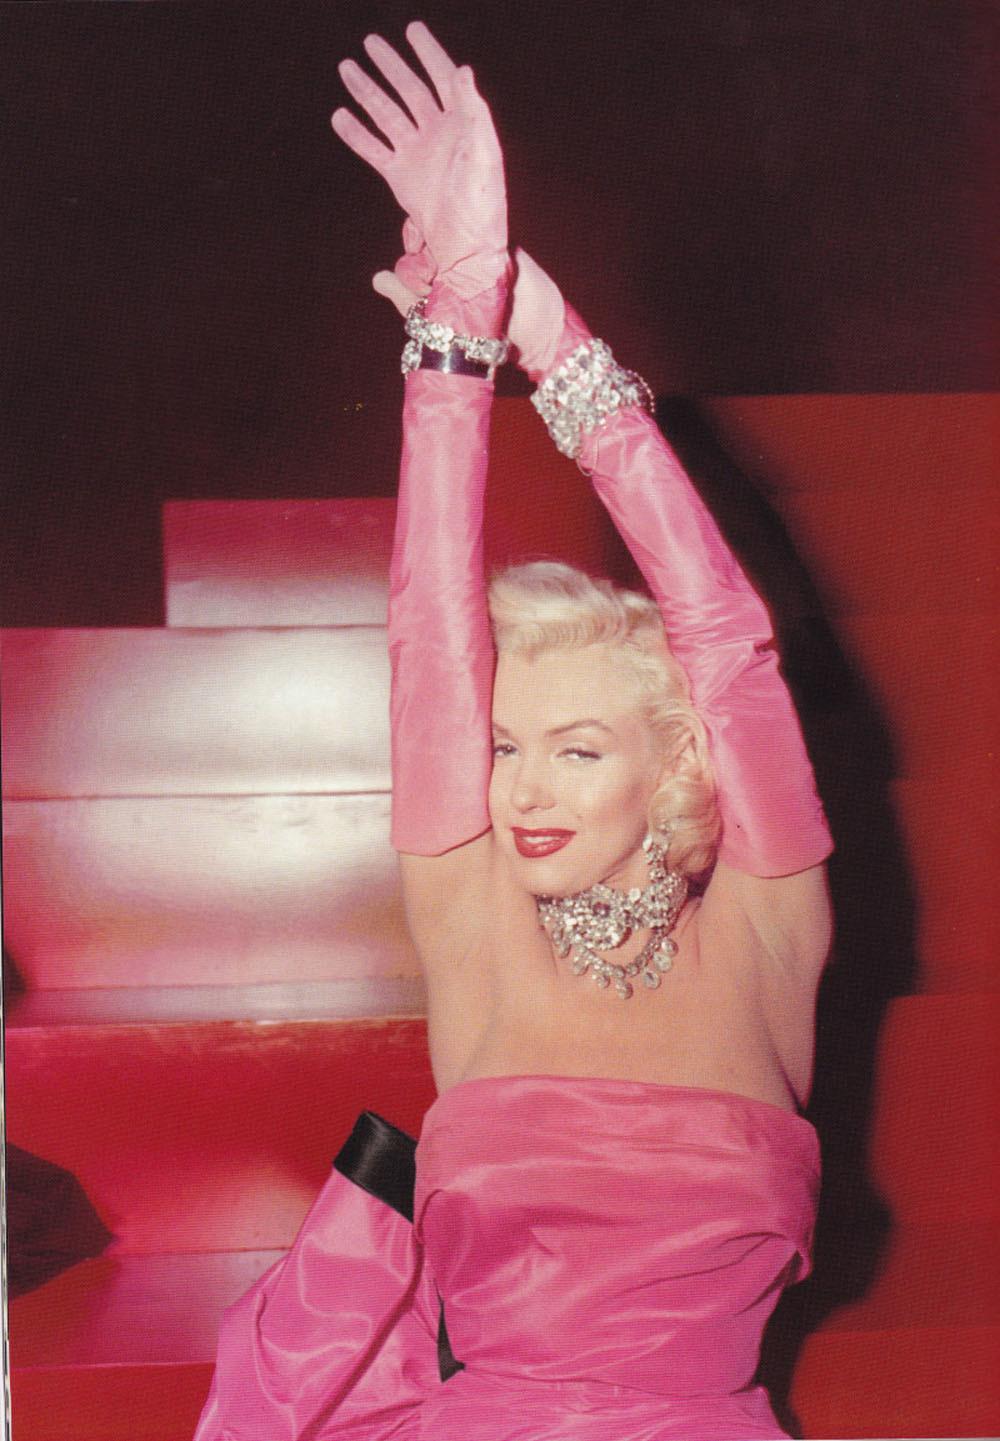 Mujeres íconos: Marilyn Monroe